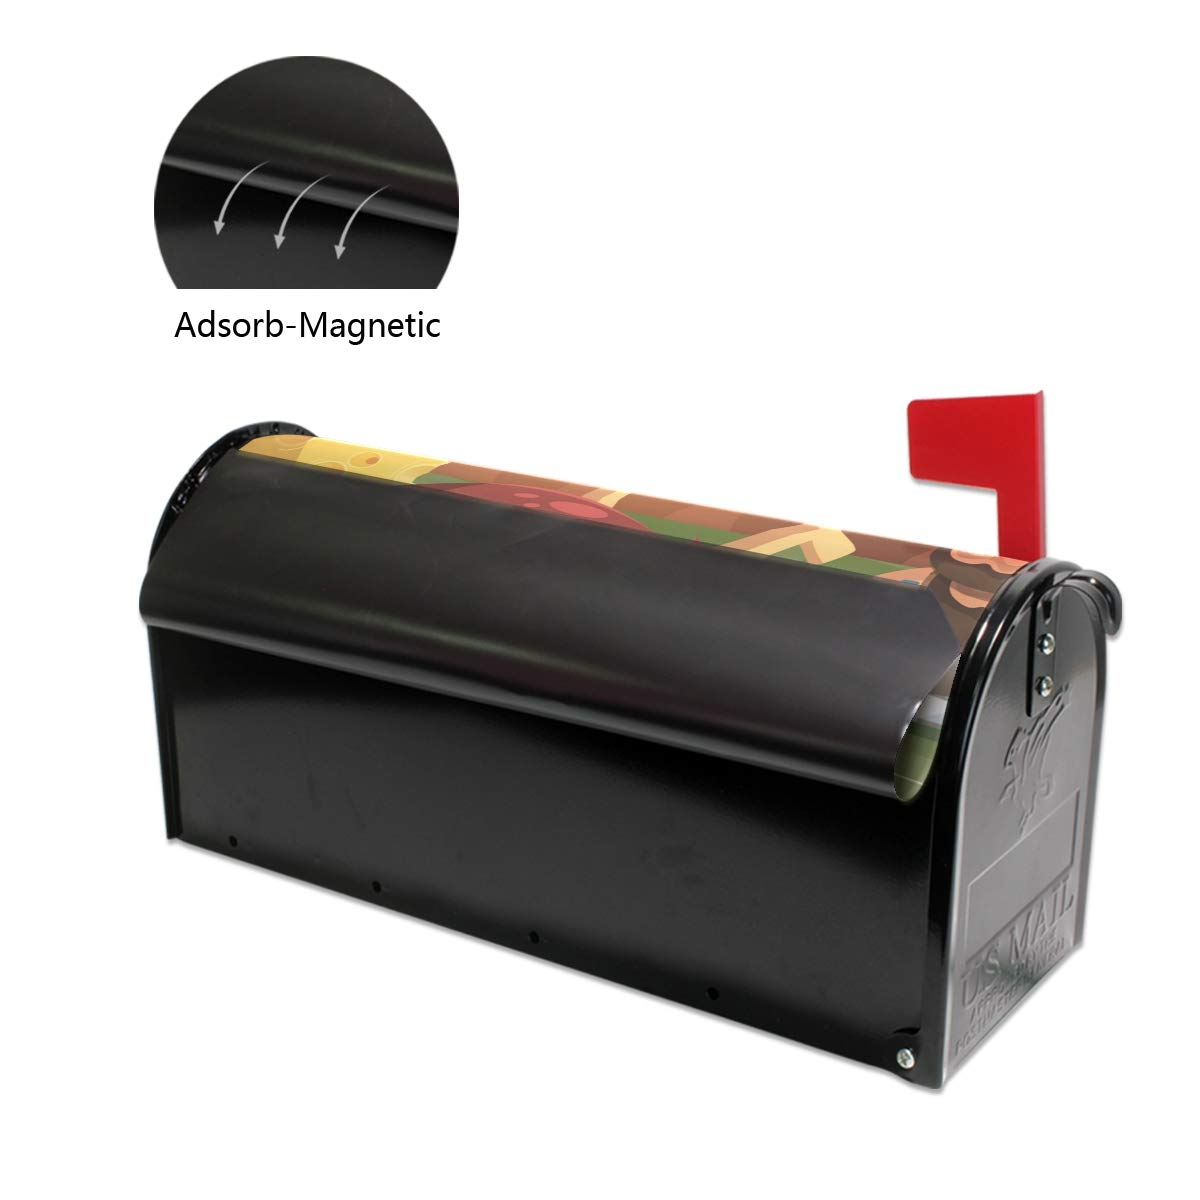 HEOEH - Cubierta magnética magnética magnética para buzón de Regalo, diseño de Turquesa, tamaño Grande, 63,5 x 50,8 cm 0bfab7